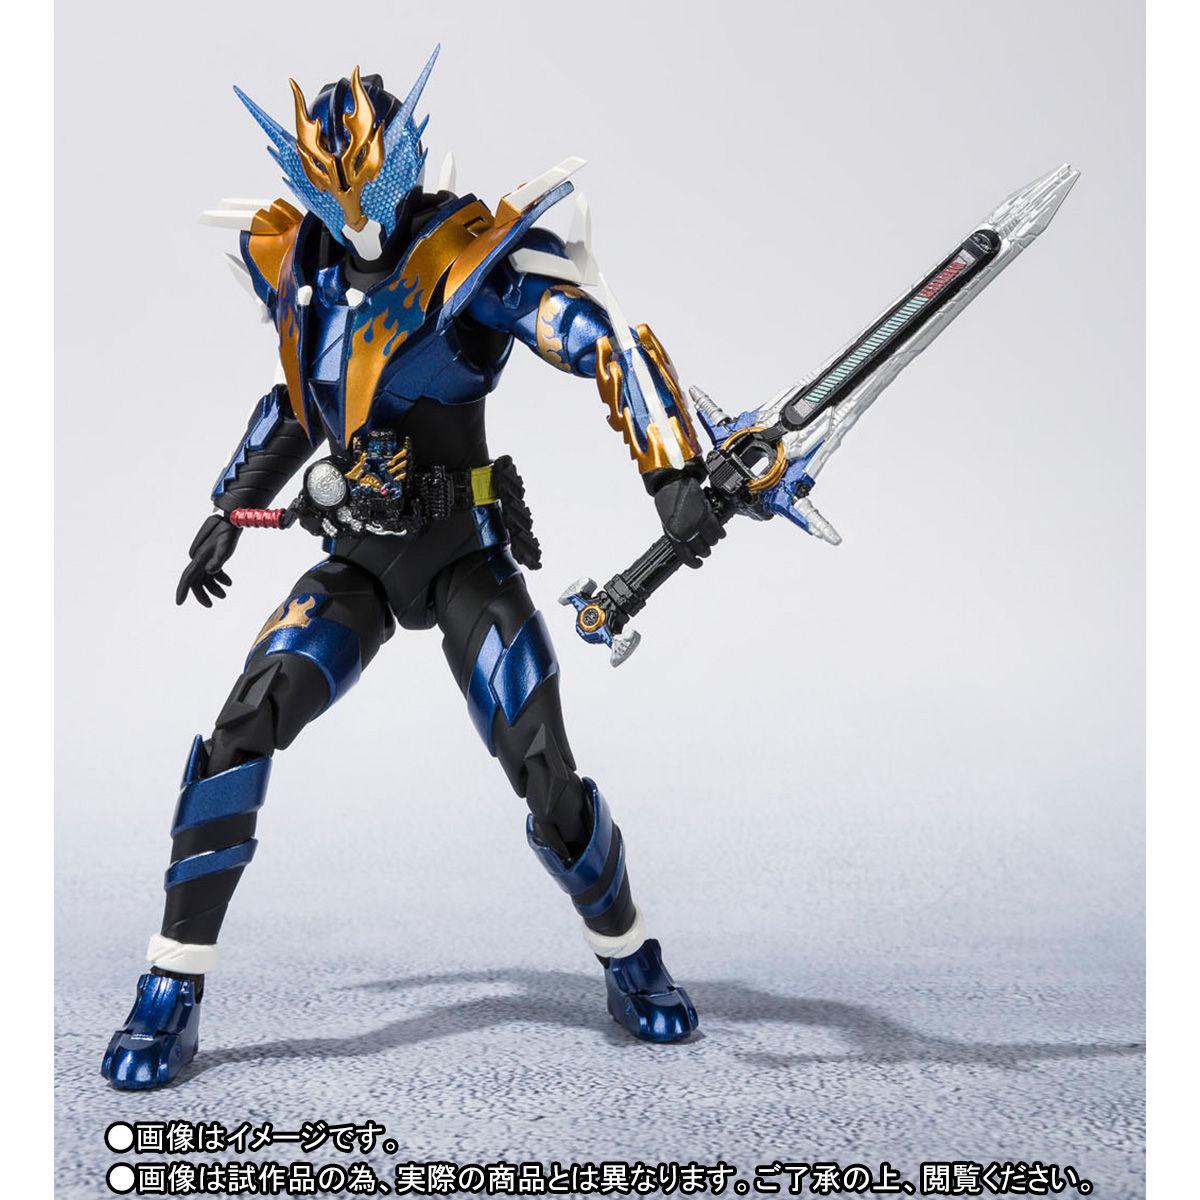 S.H.Figuarts 仮面ライダークローズ-006